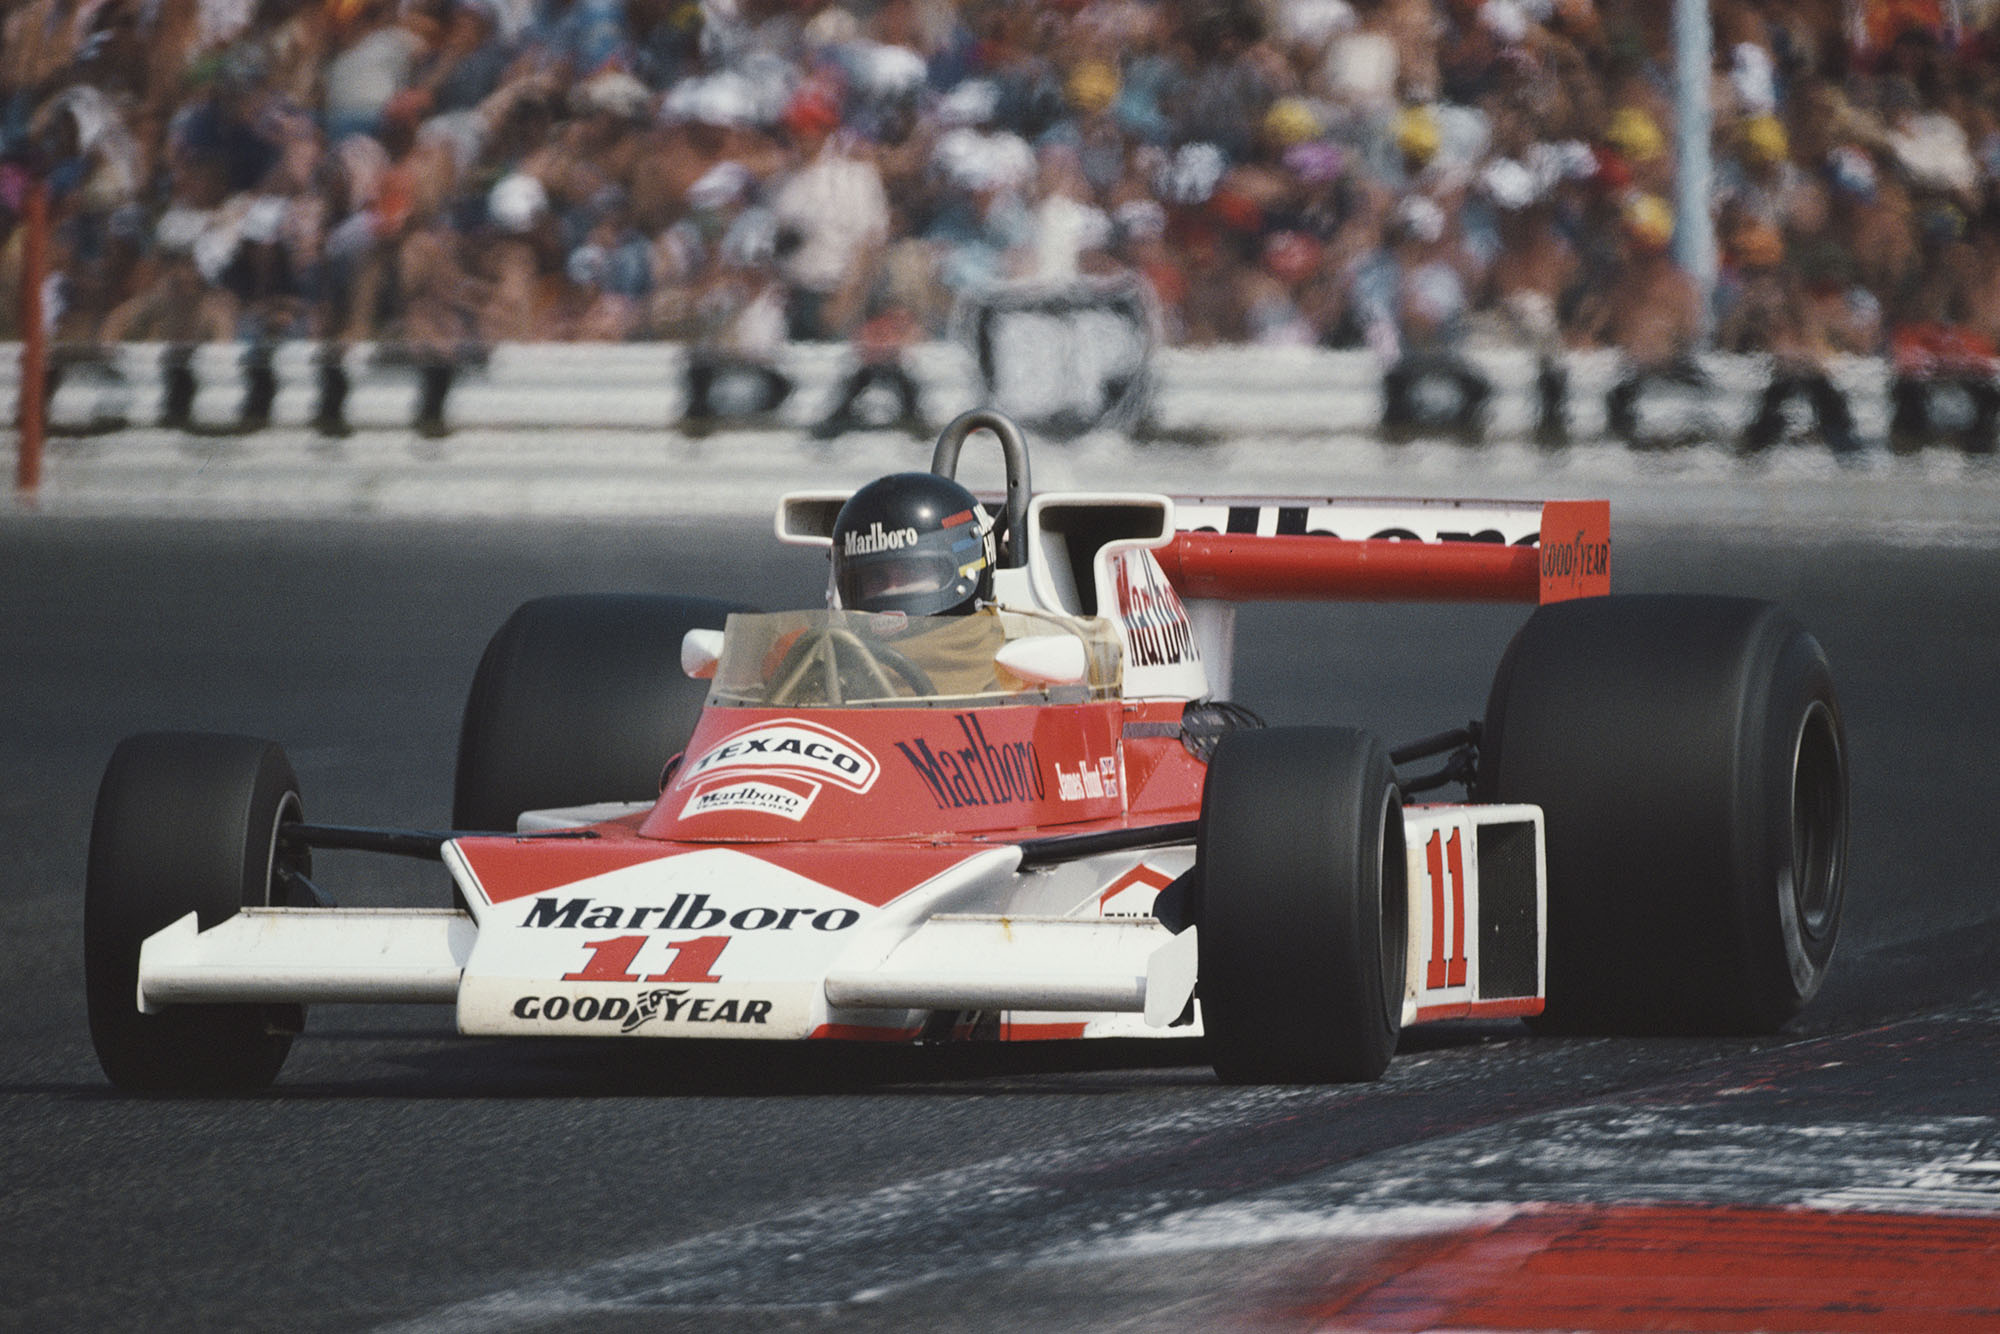 James Hunt (McLAren) at the 1976 French Grand Prix, Paul Ricard.